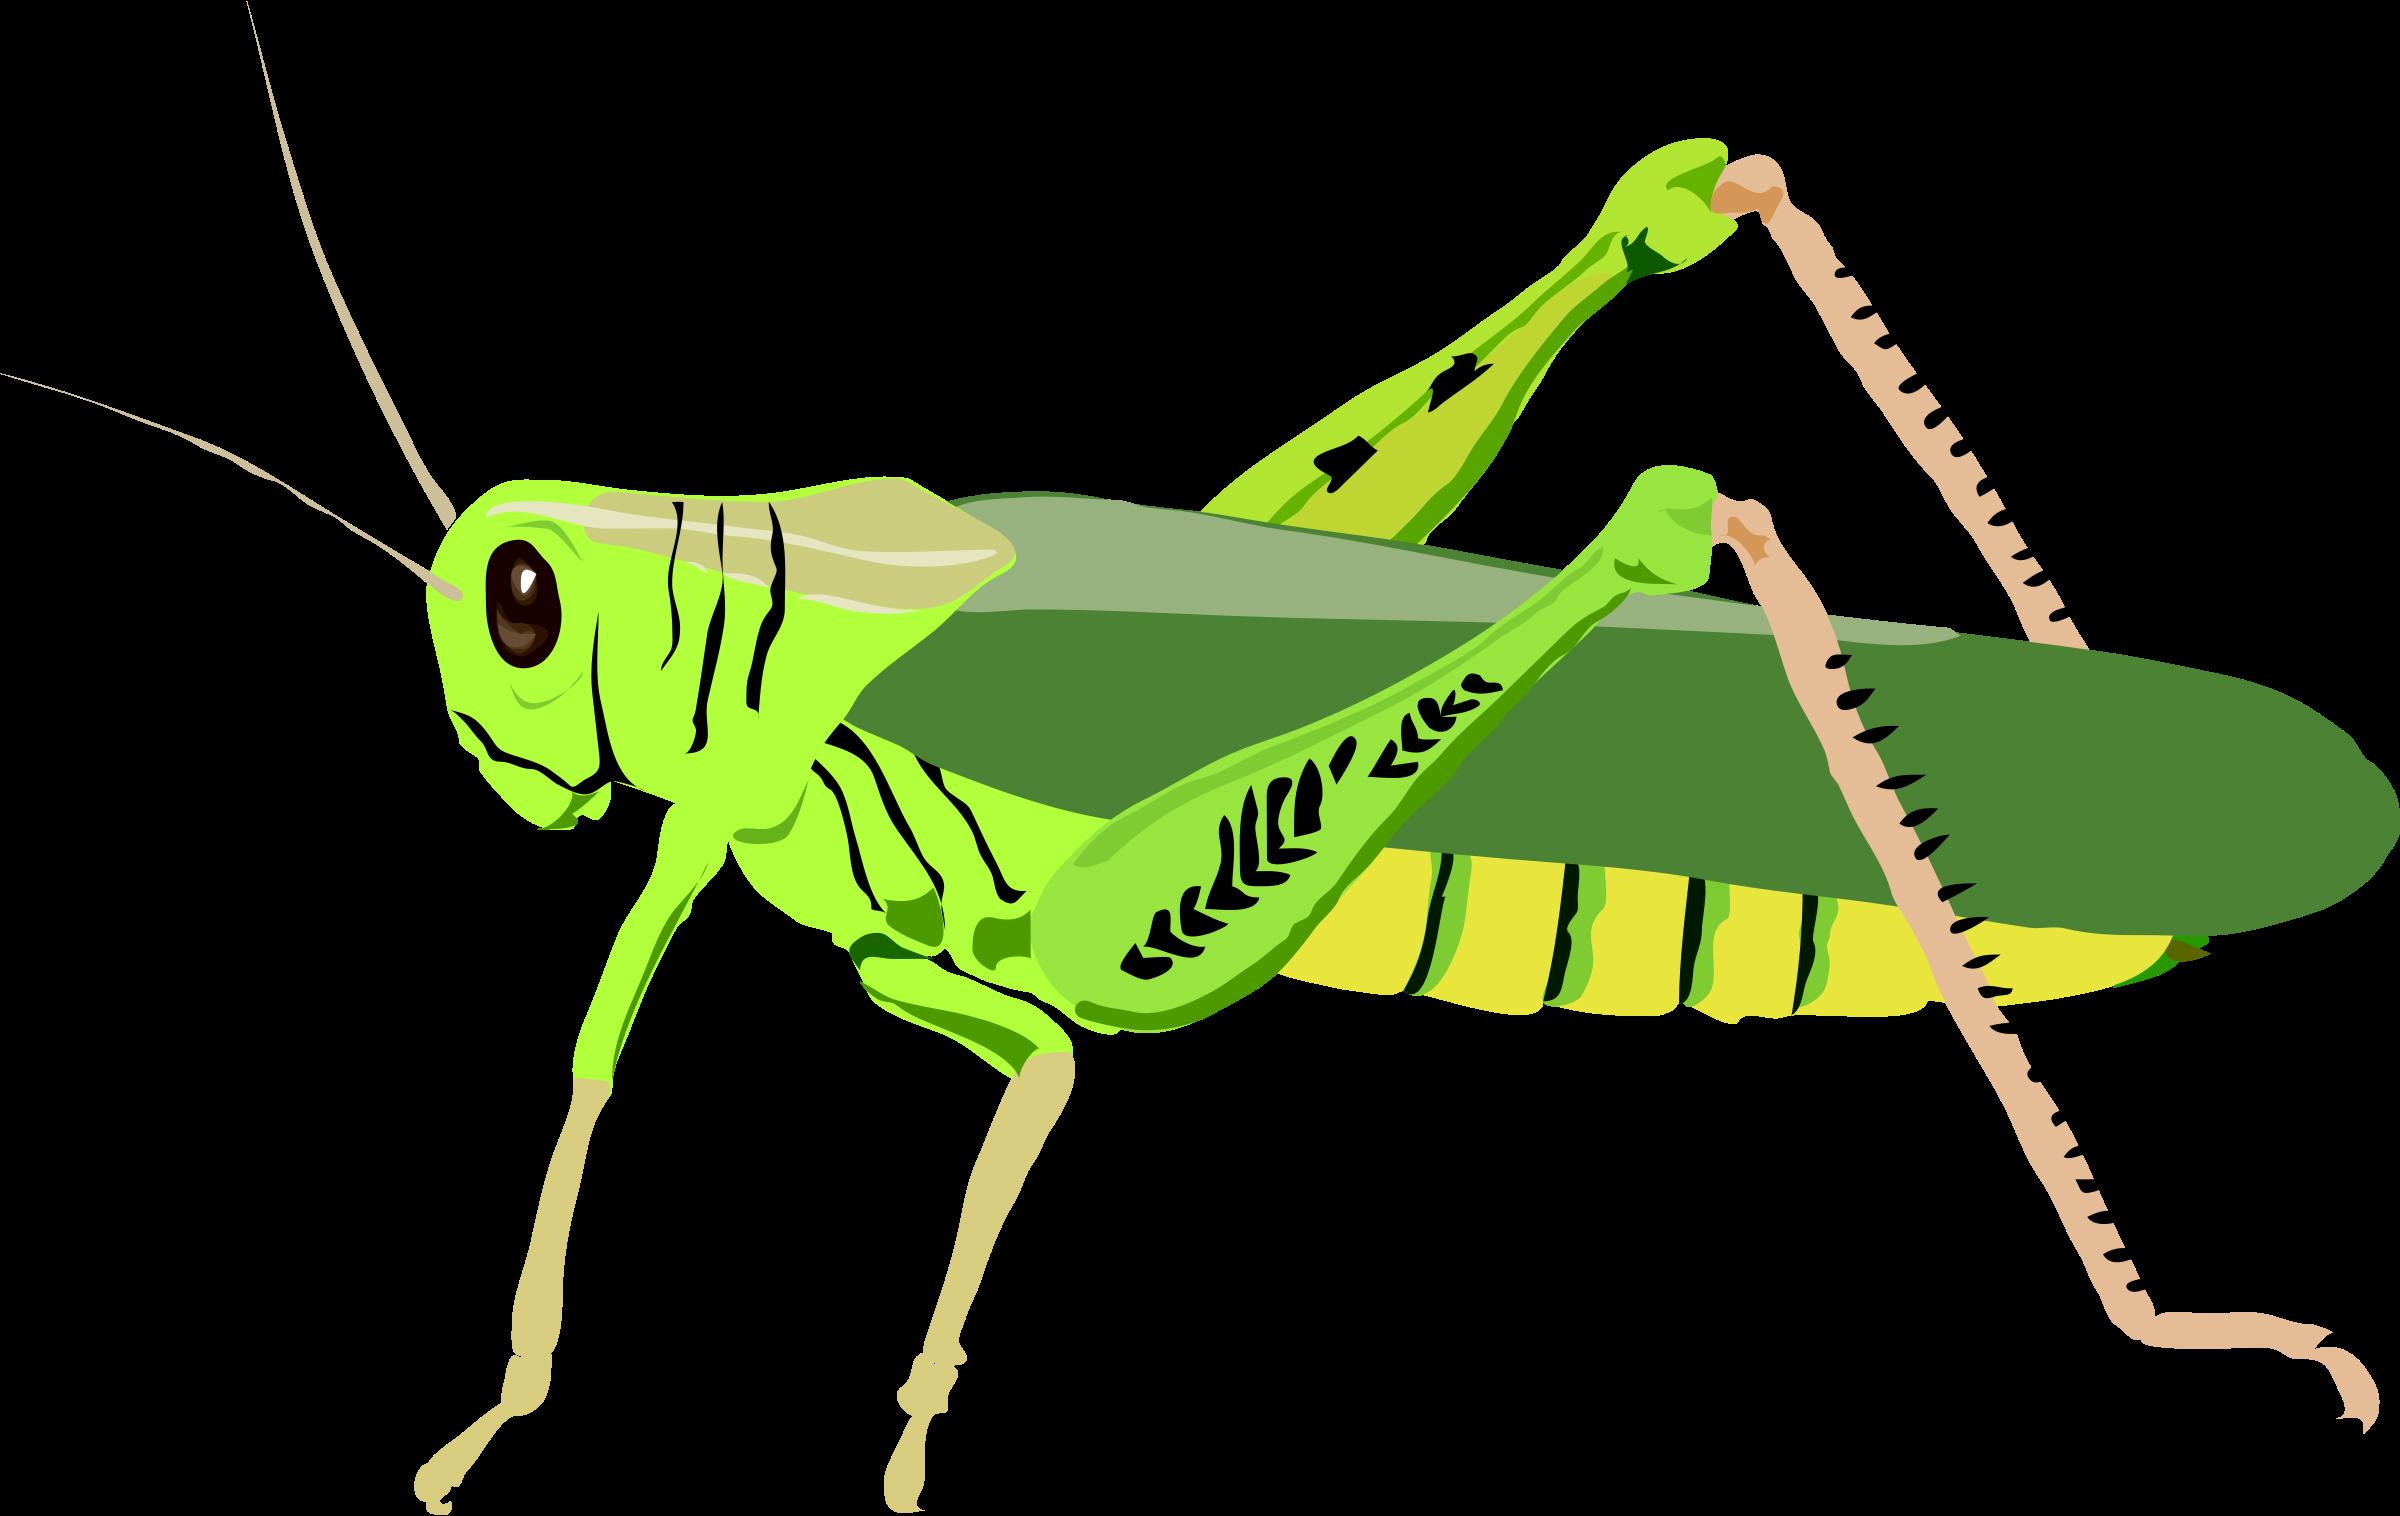 Grasshopper clipart Grasshopper Clip Images Clipart Clipart